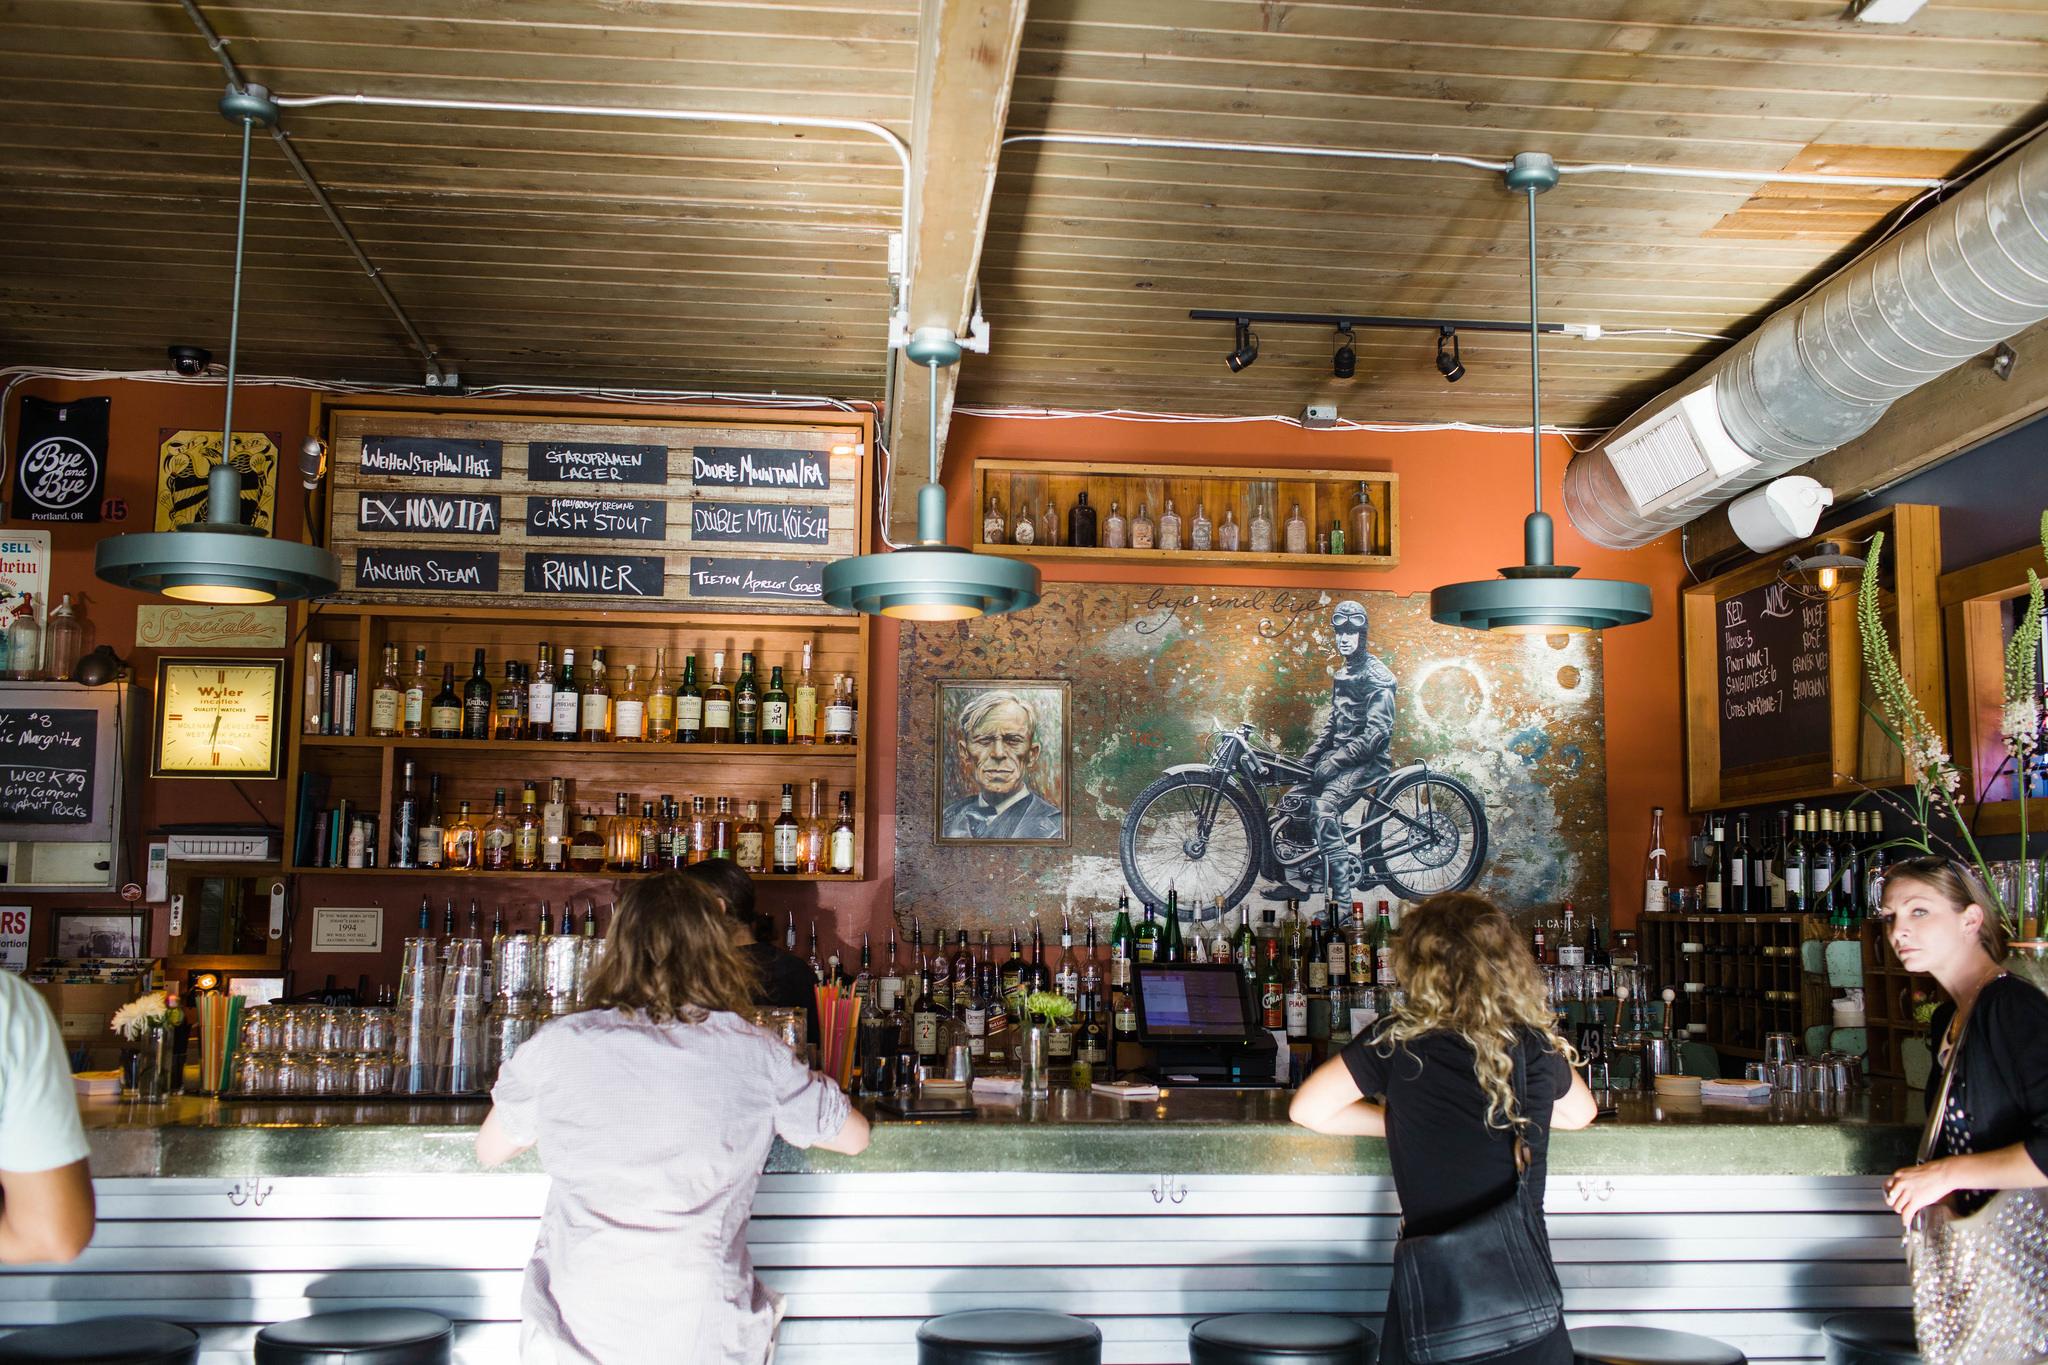 Bye and Bye, a vegan bar in Portland, Oregon   vegetarianPDX